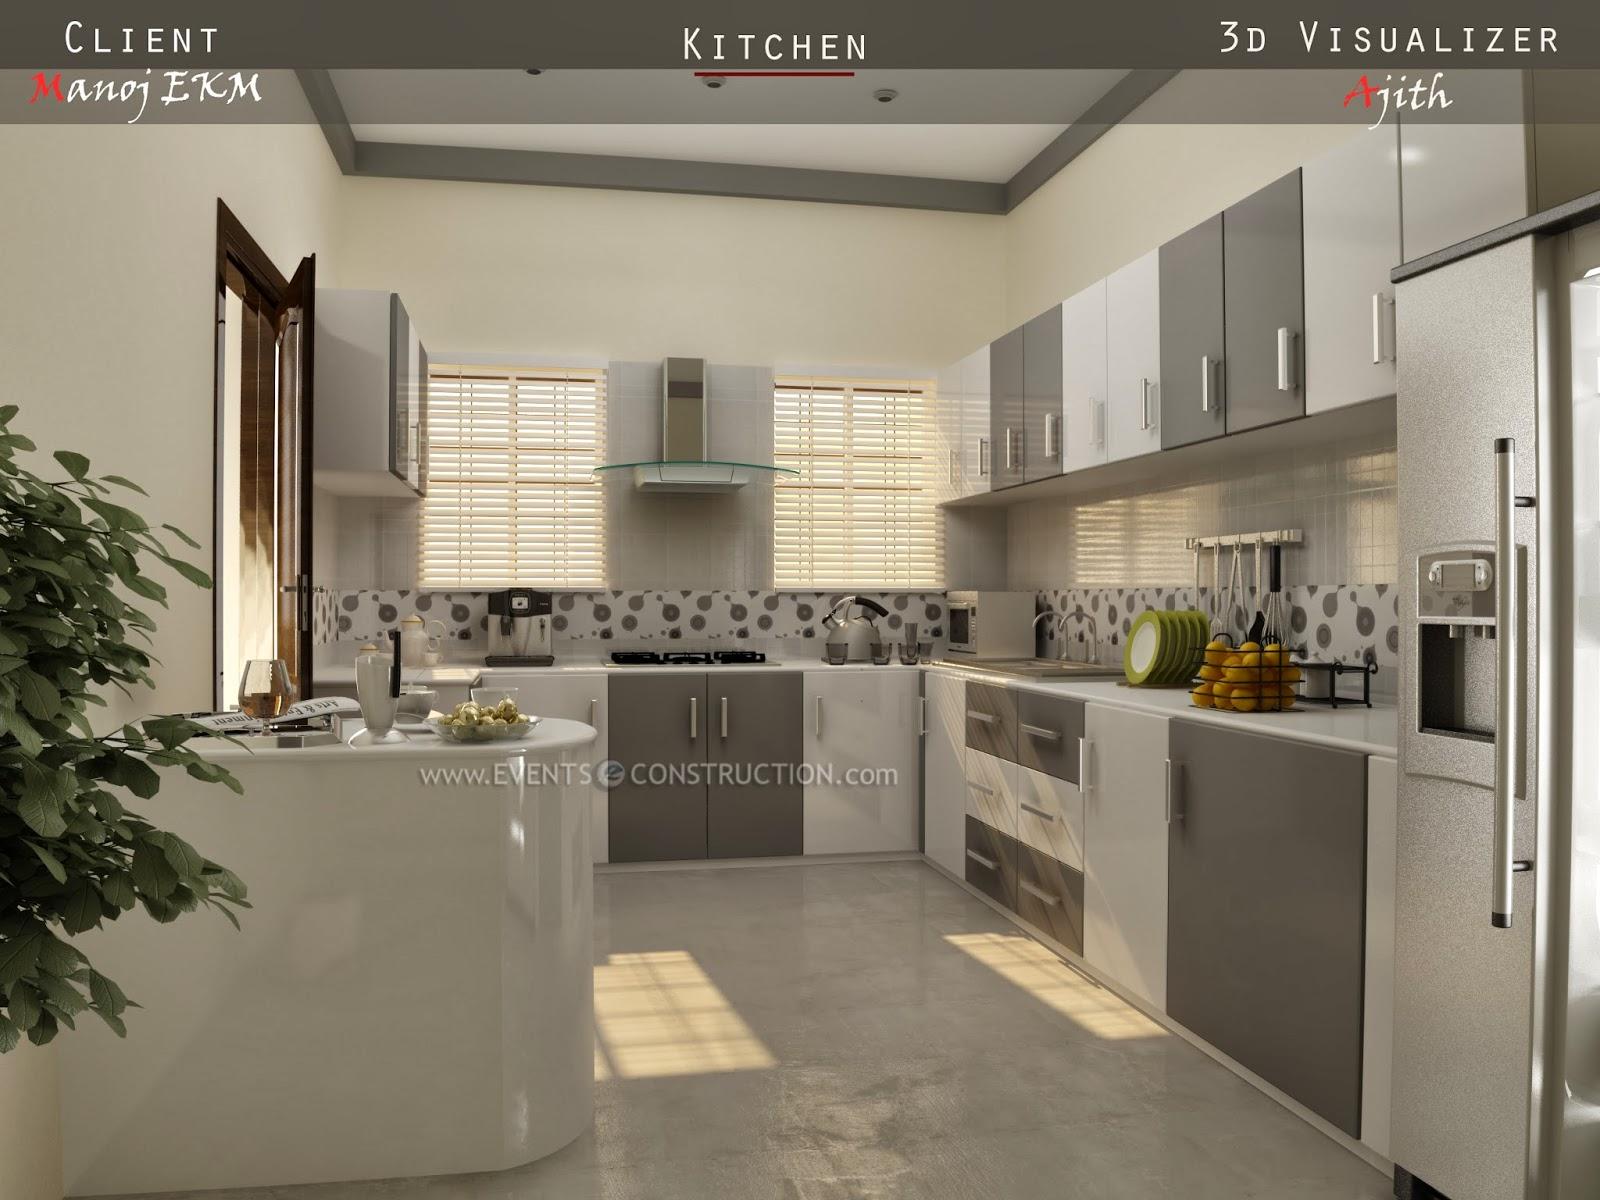 Evens construction pvt ltd kitchen interior design for Villa interior designers ltd nairobi kenya